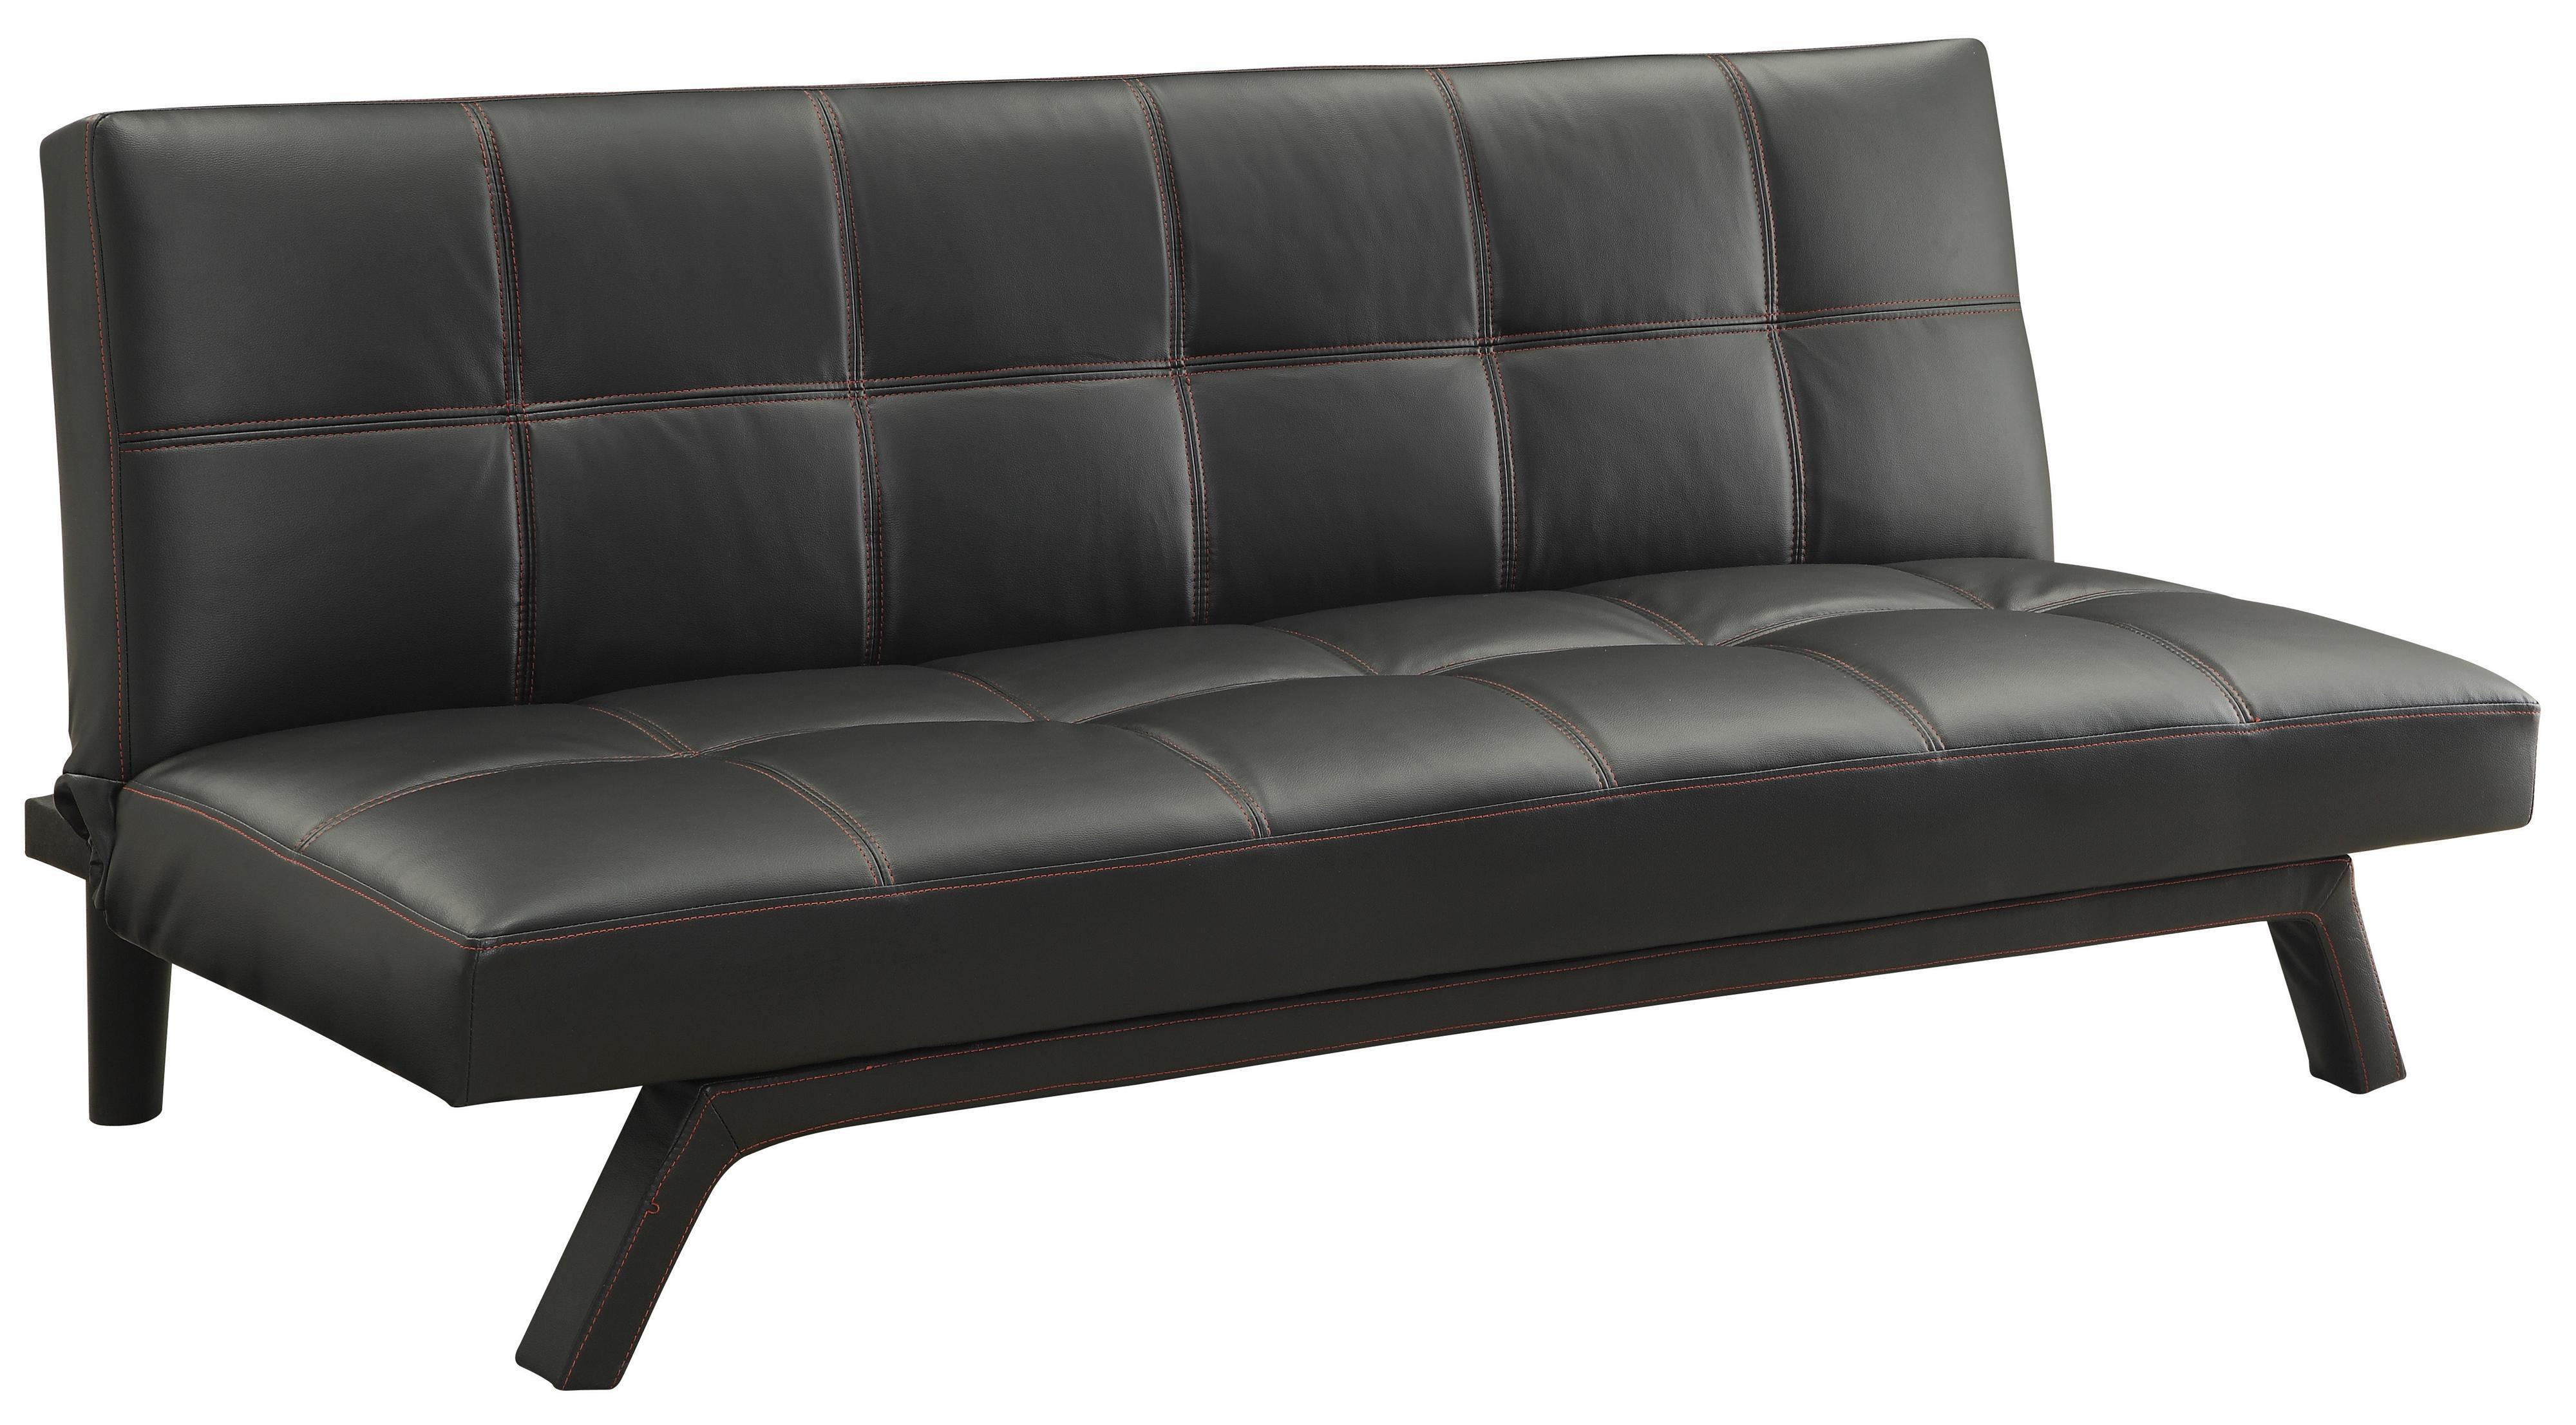 Coaster Sofa Beds and Futons Sofa Bed - Item Number: 500765